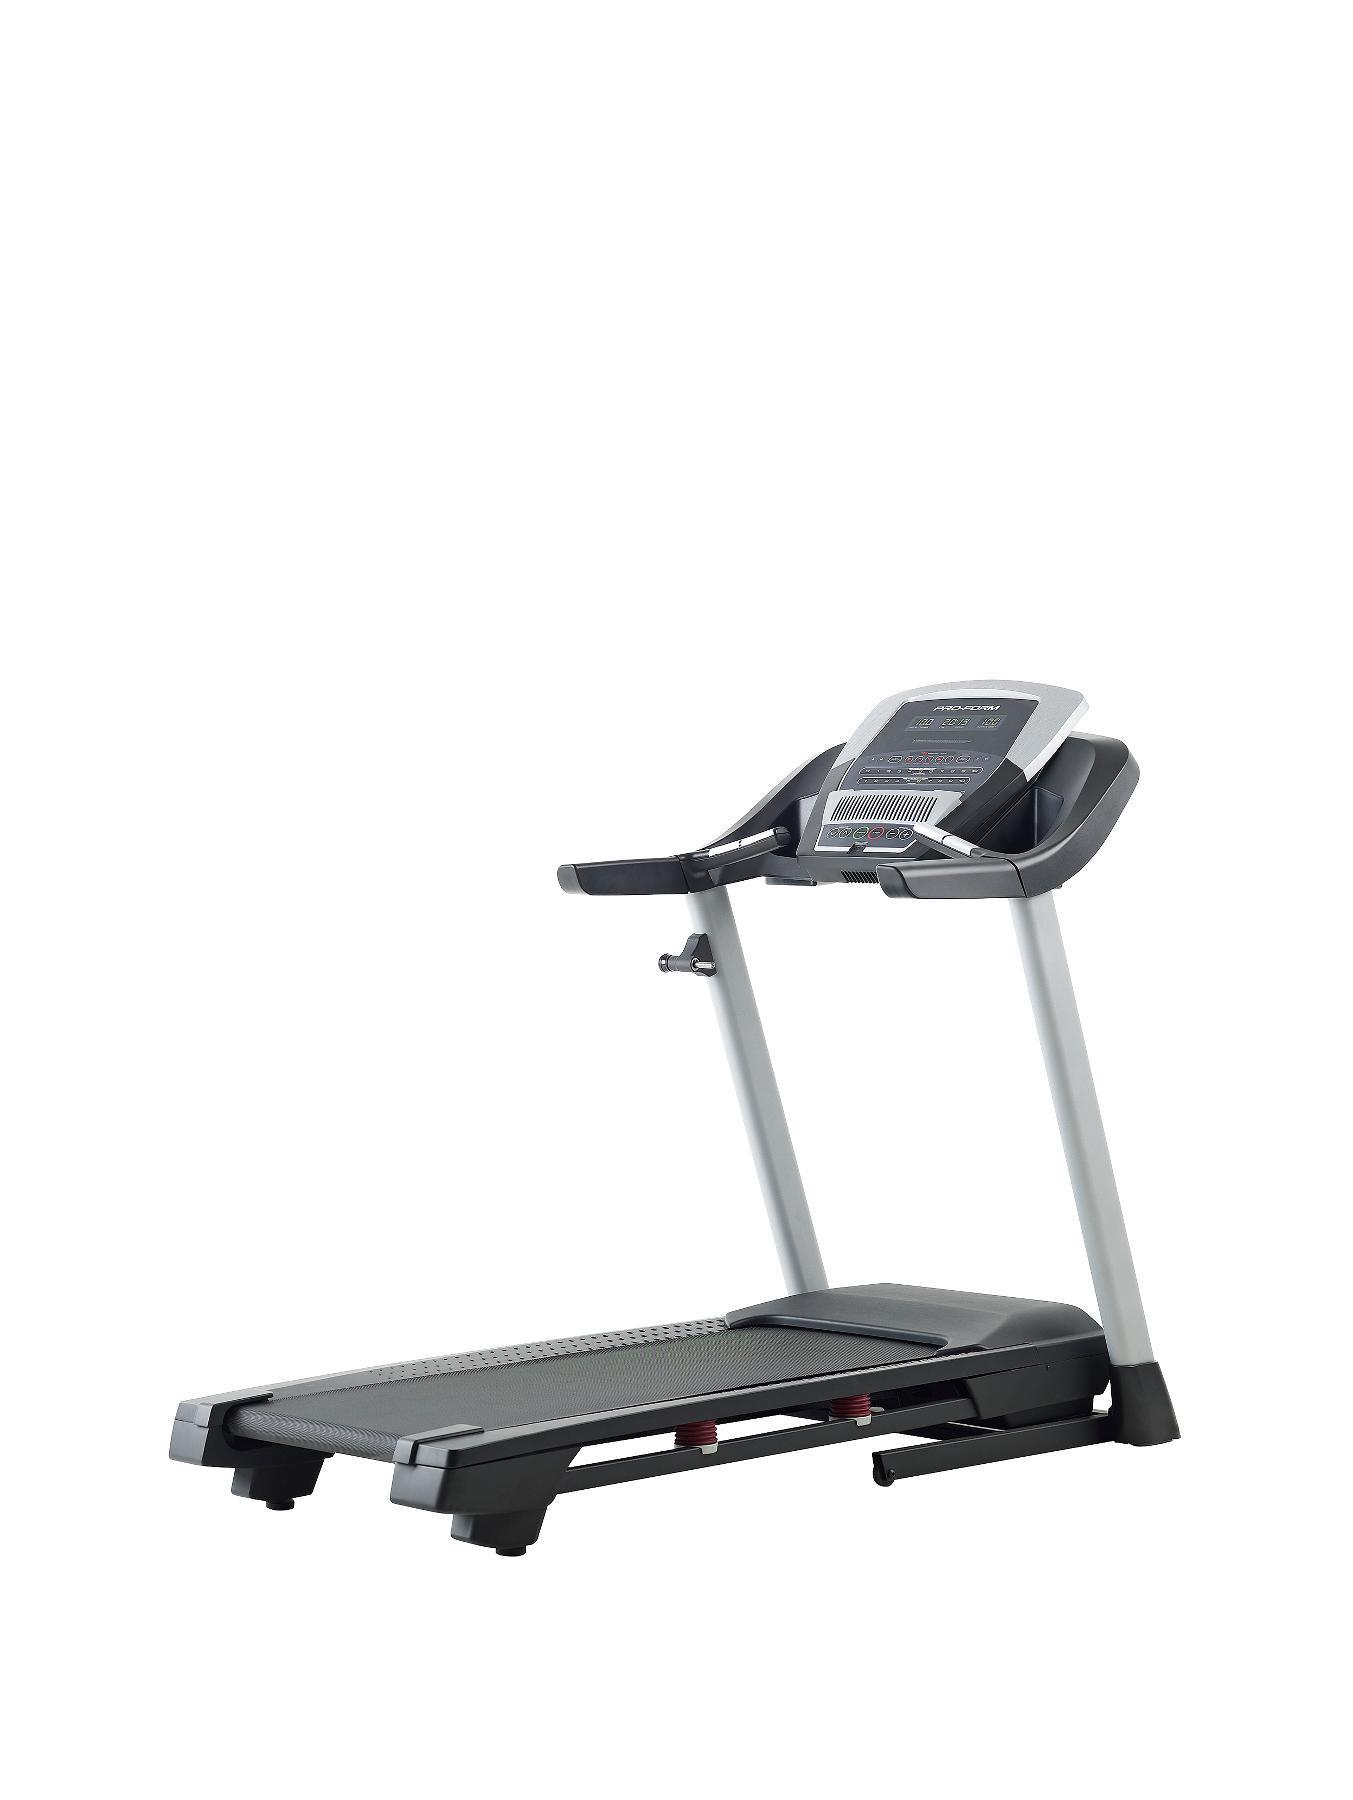 Pro-Form Endurance S9 Treadmill